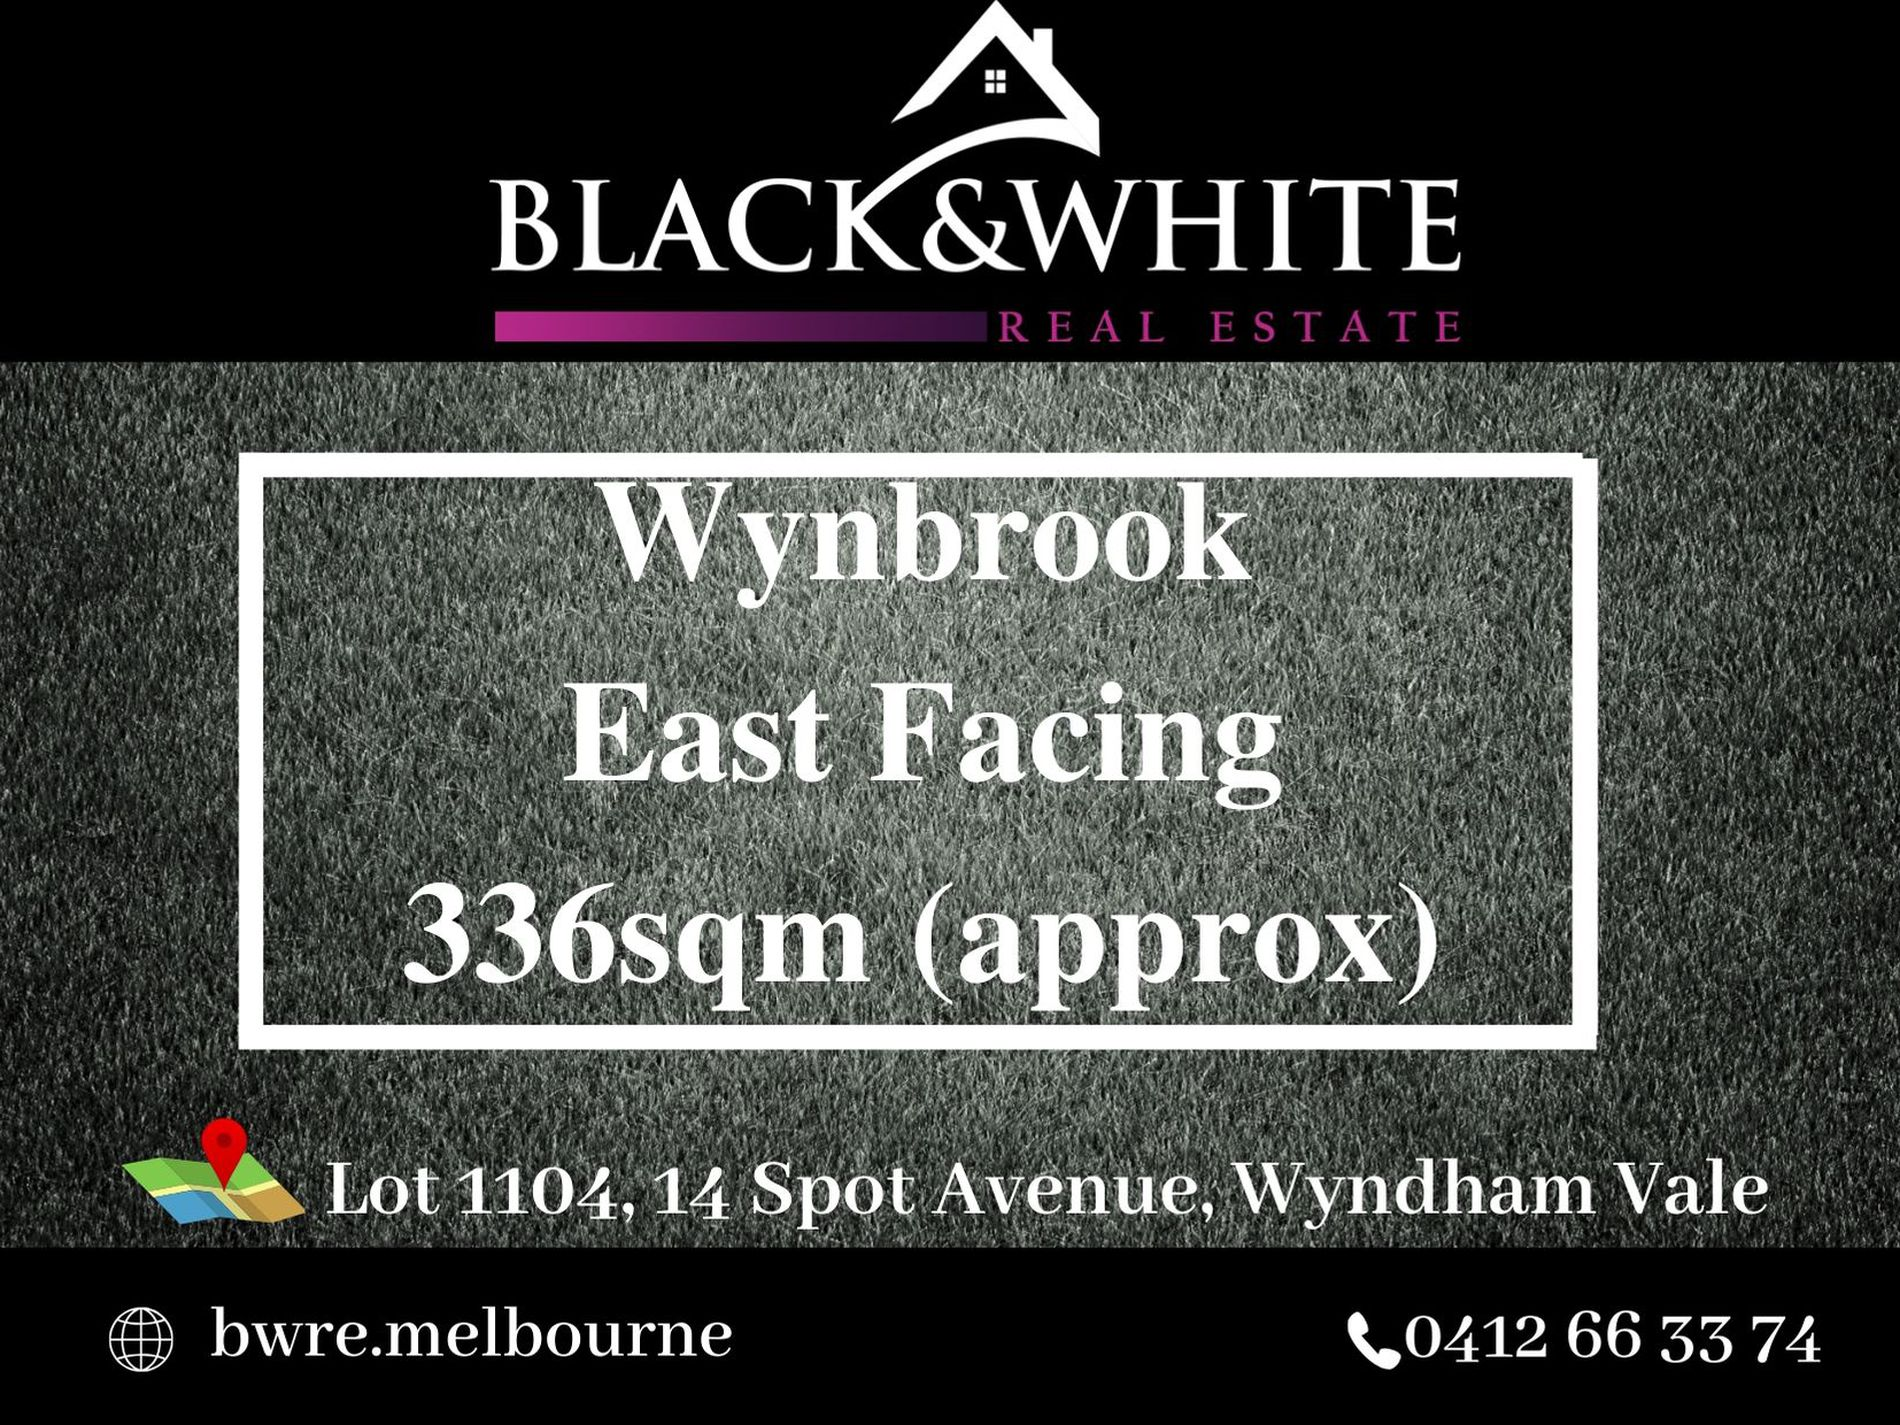 14 Spot Avenue, Wyndham Vale